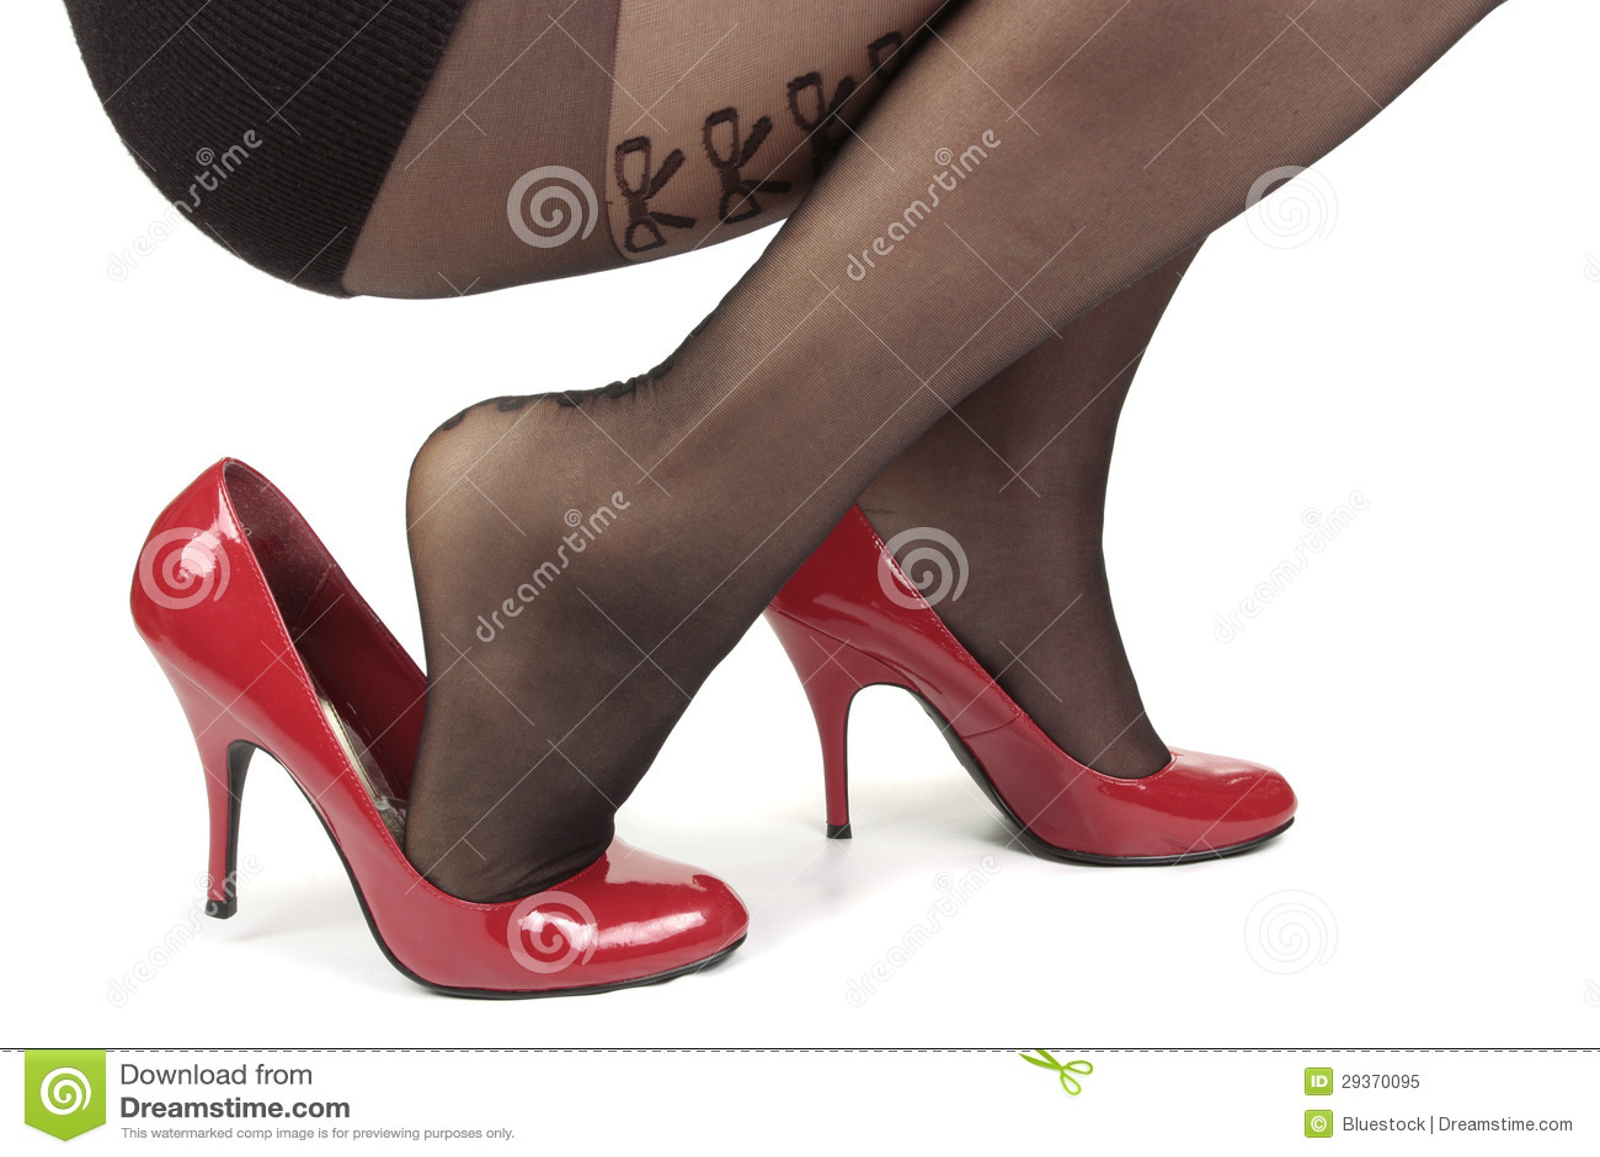 Женские пятки в колготках фото фото 32-641